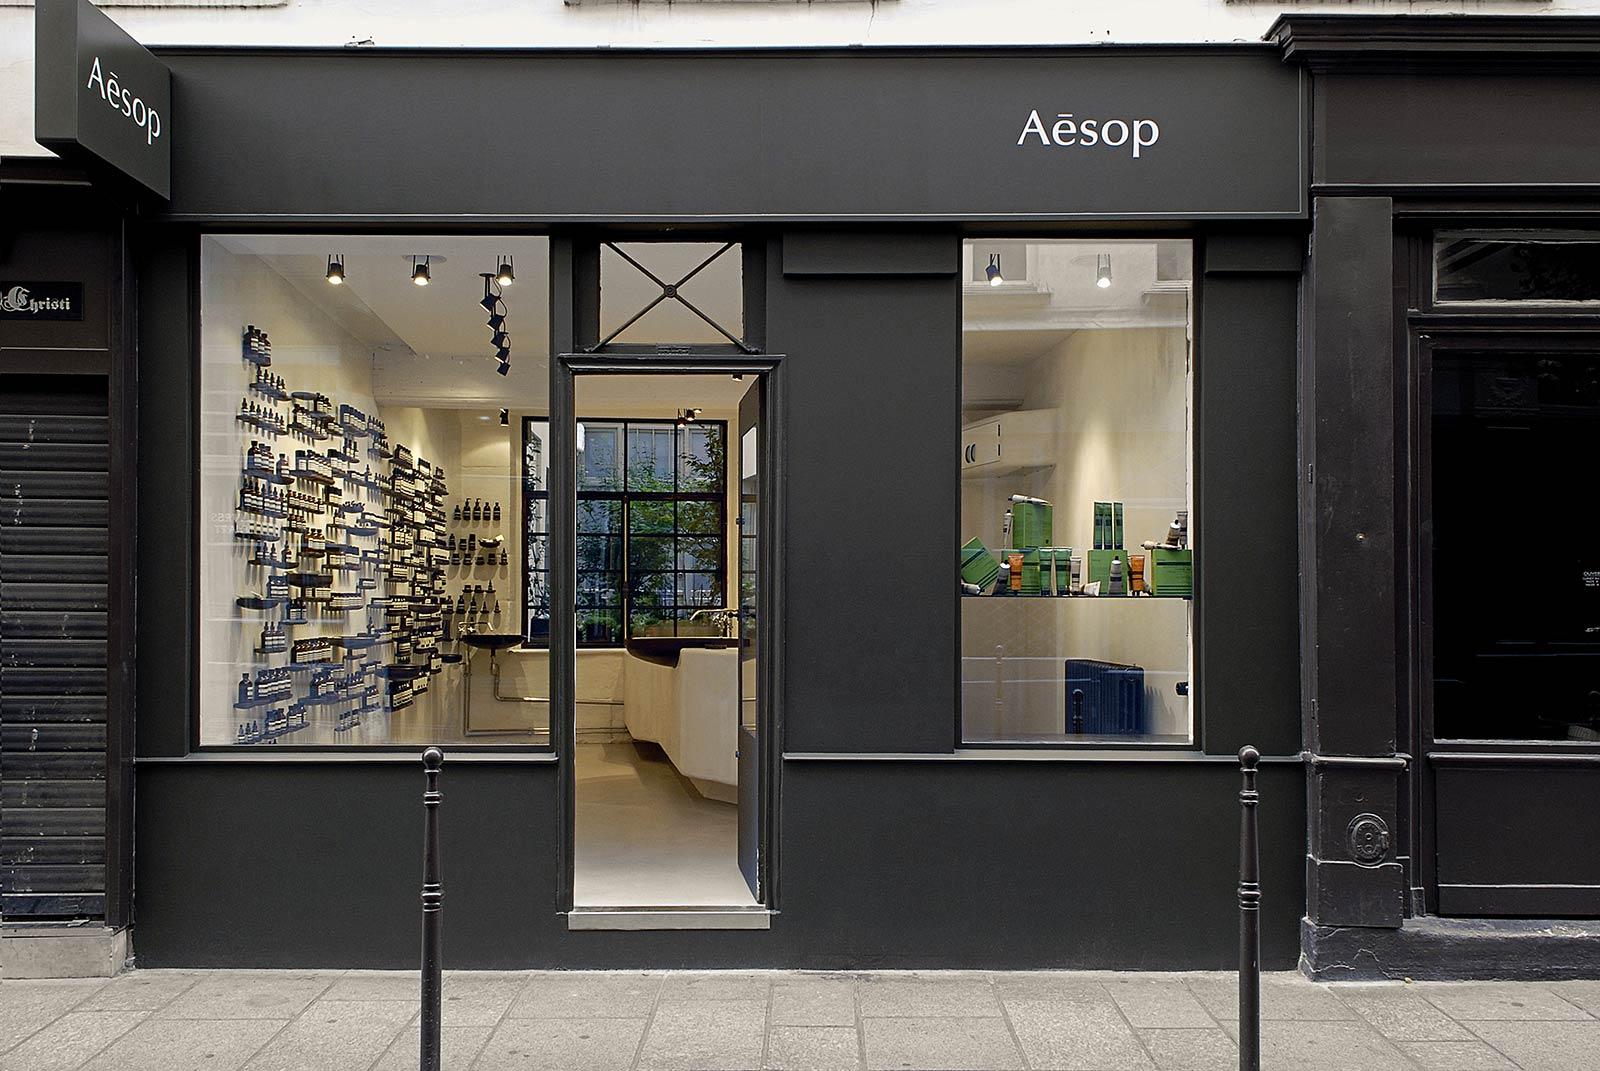 Aesop – Ciguë